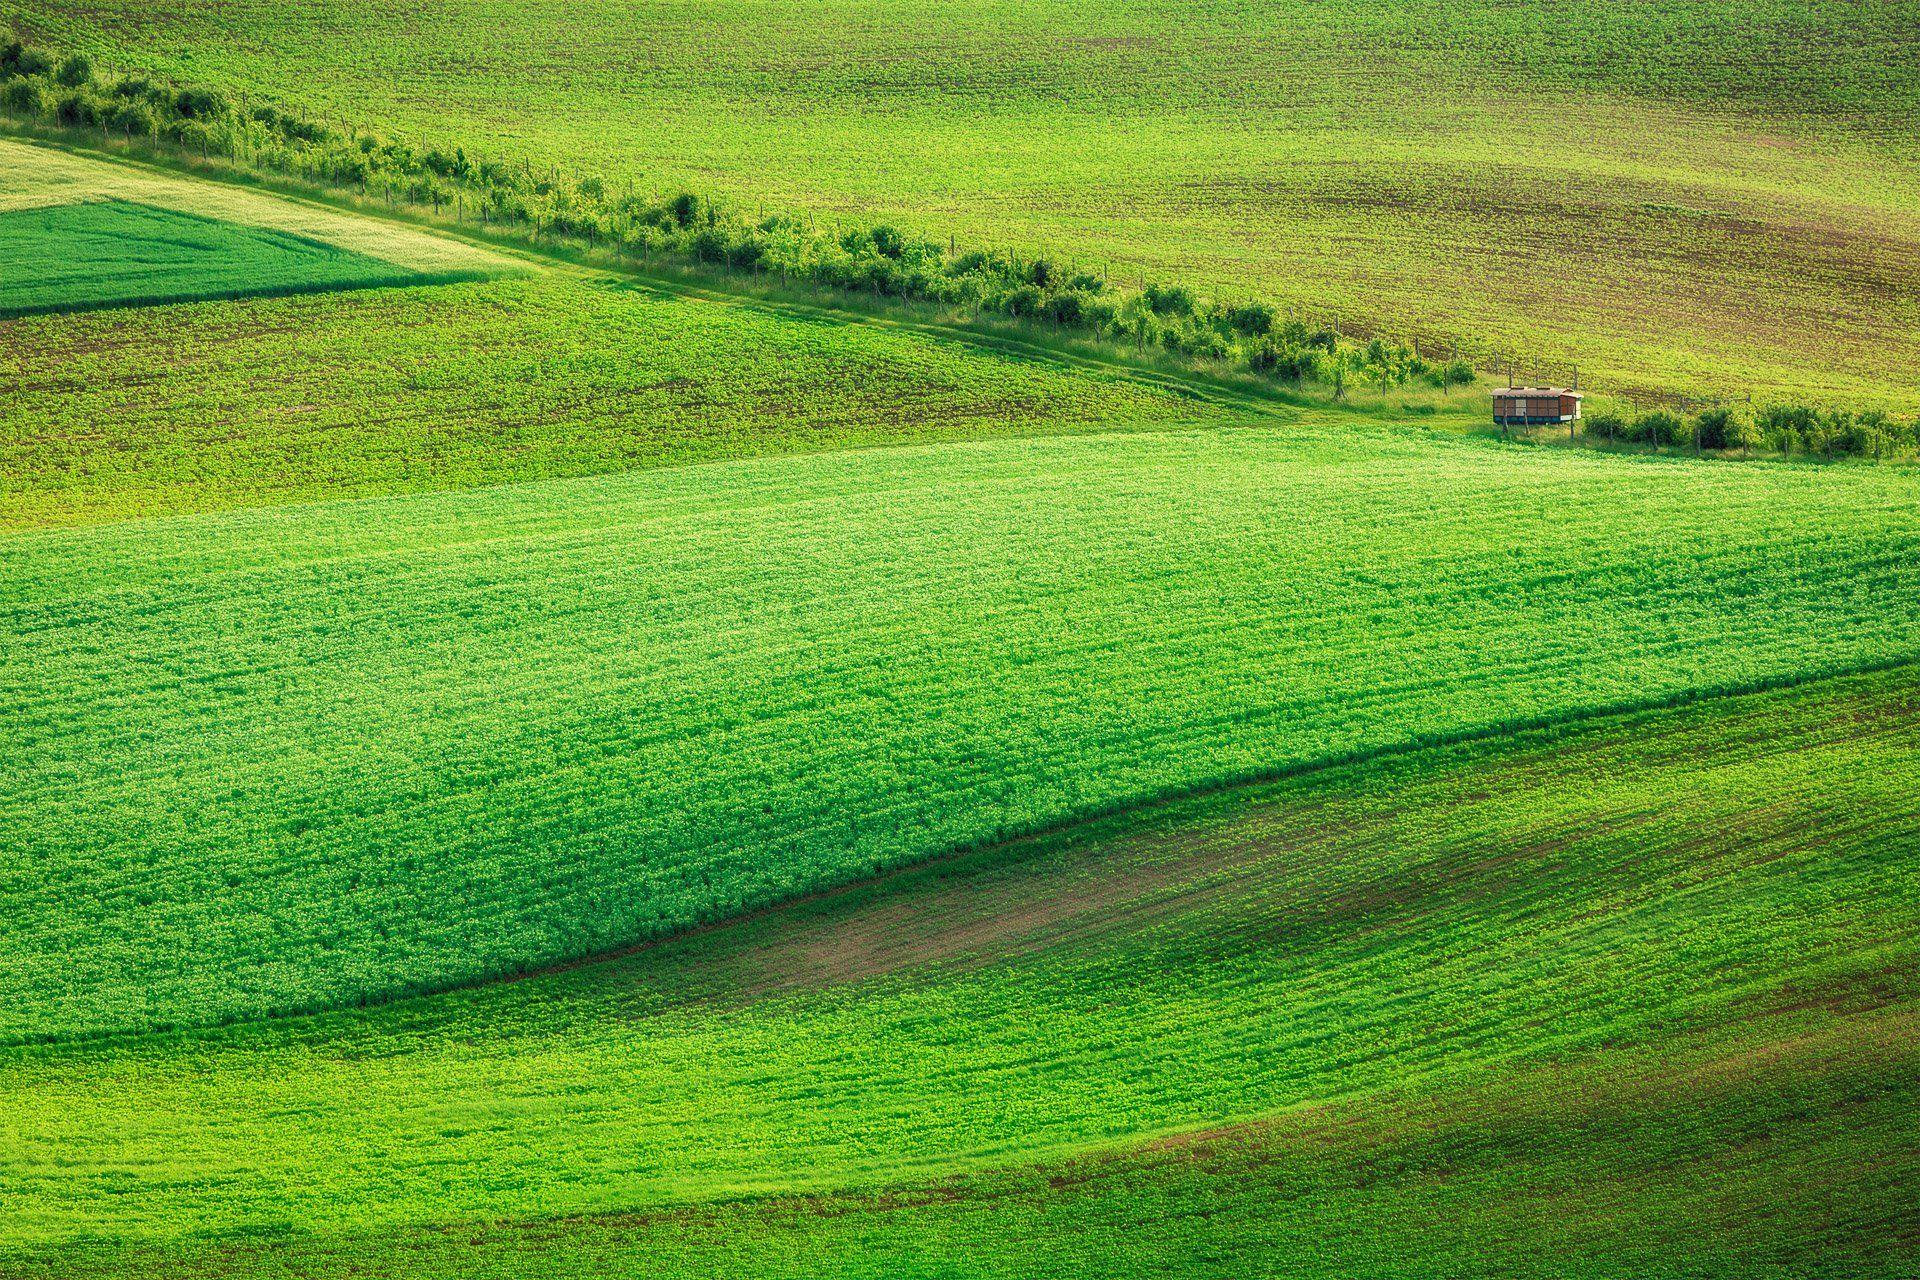 Моравия, пейзаж, Чехия, Дмитрий Рухленко